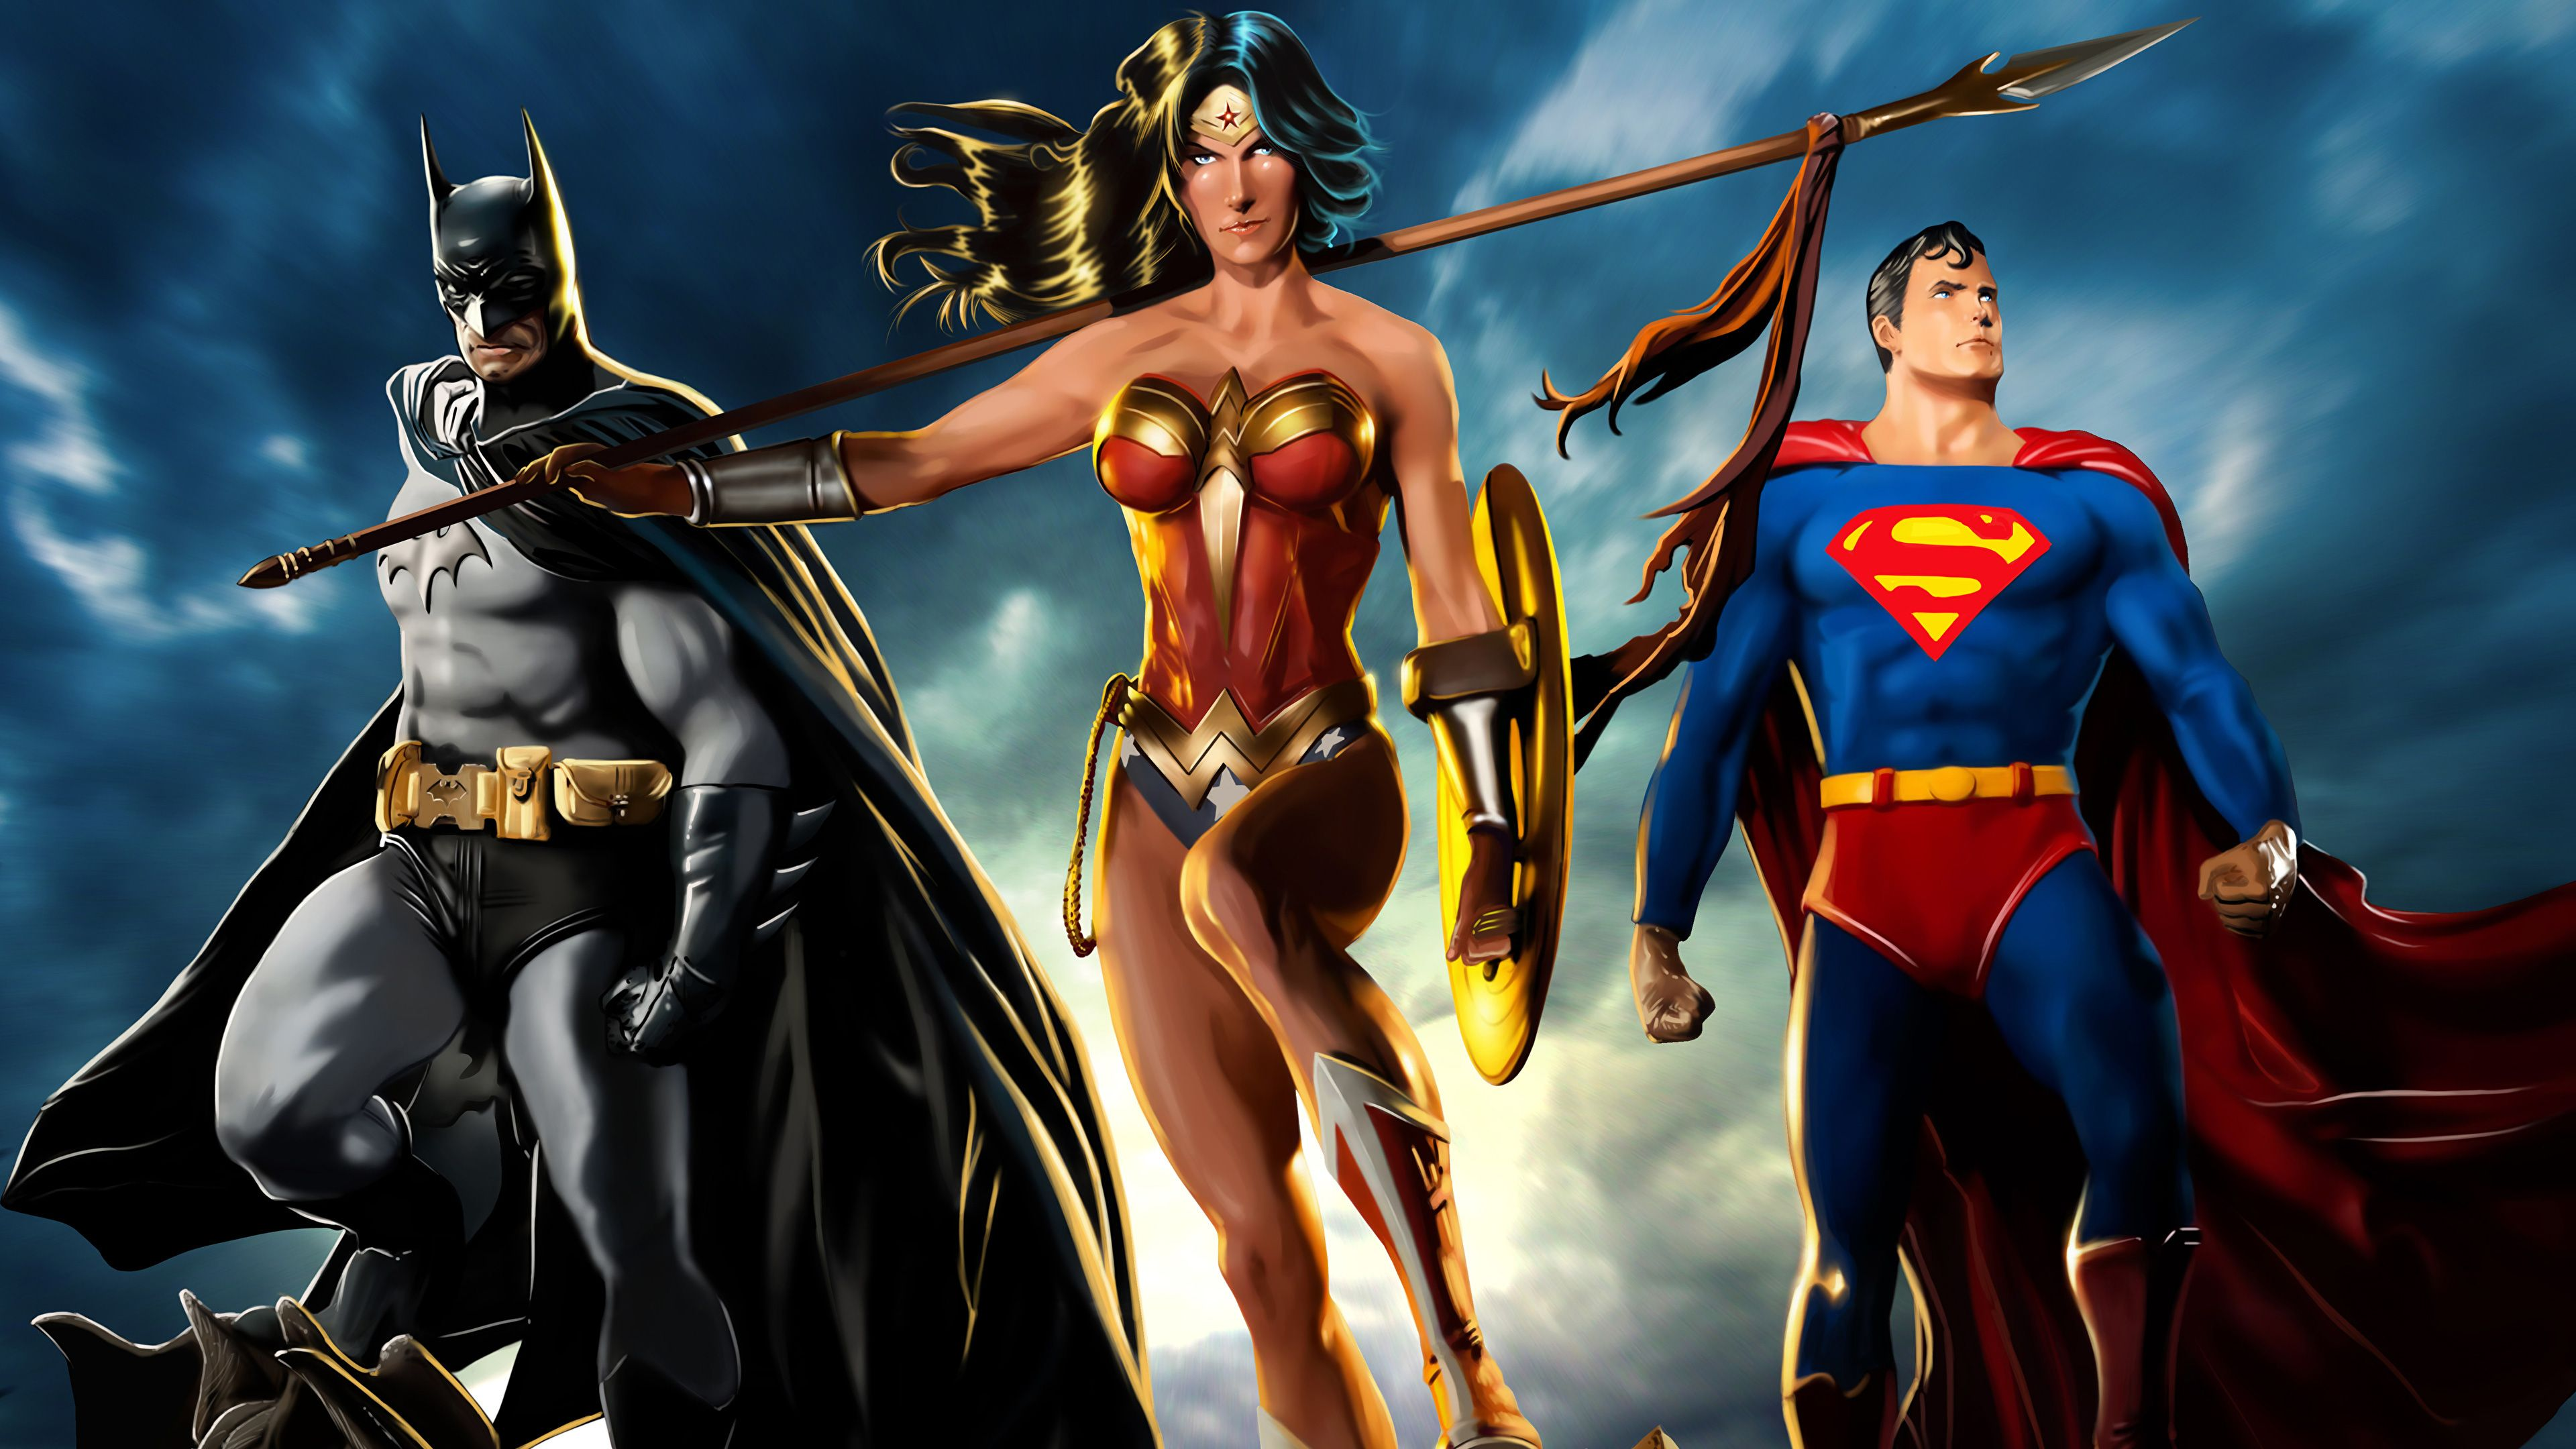 The Trinity 4k Artwork Wonder Woman Wallpapers Superman Wallpapers Superheroes Wallpapers Hd Wa Batman Superman Wonder Woman Superman Wallpaper Wonder Woman